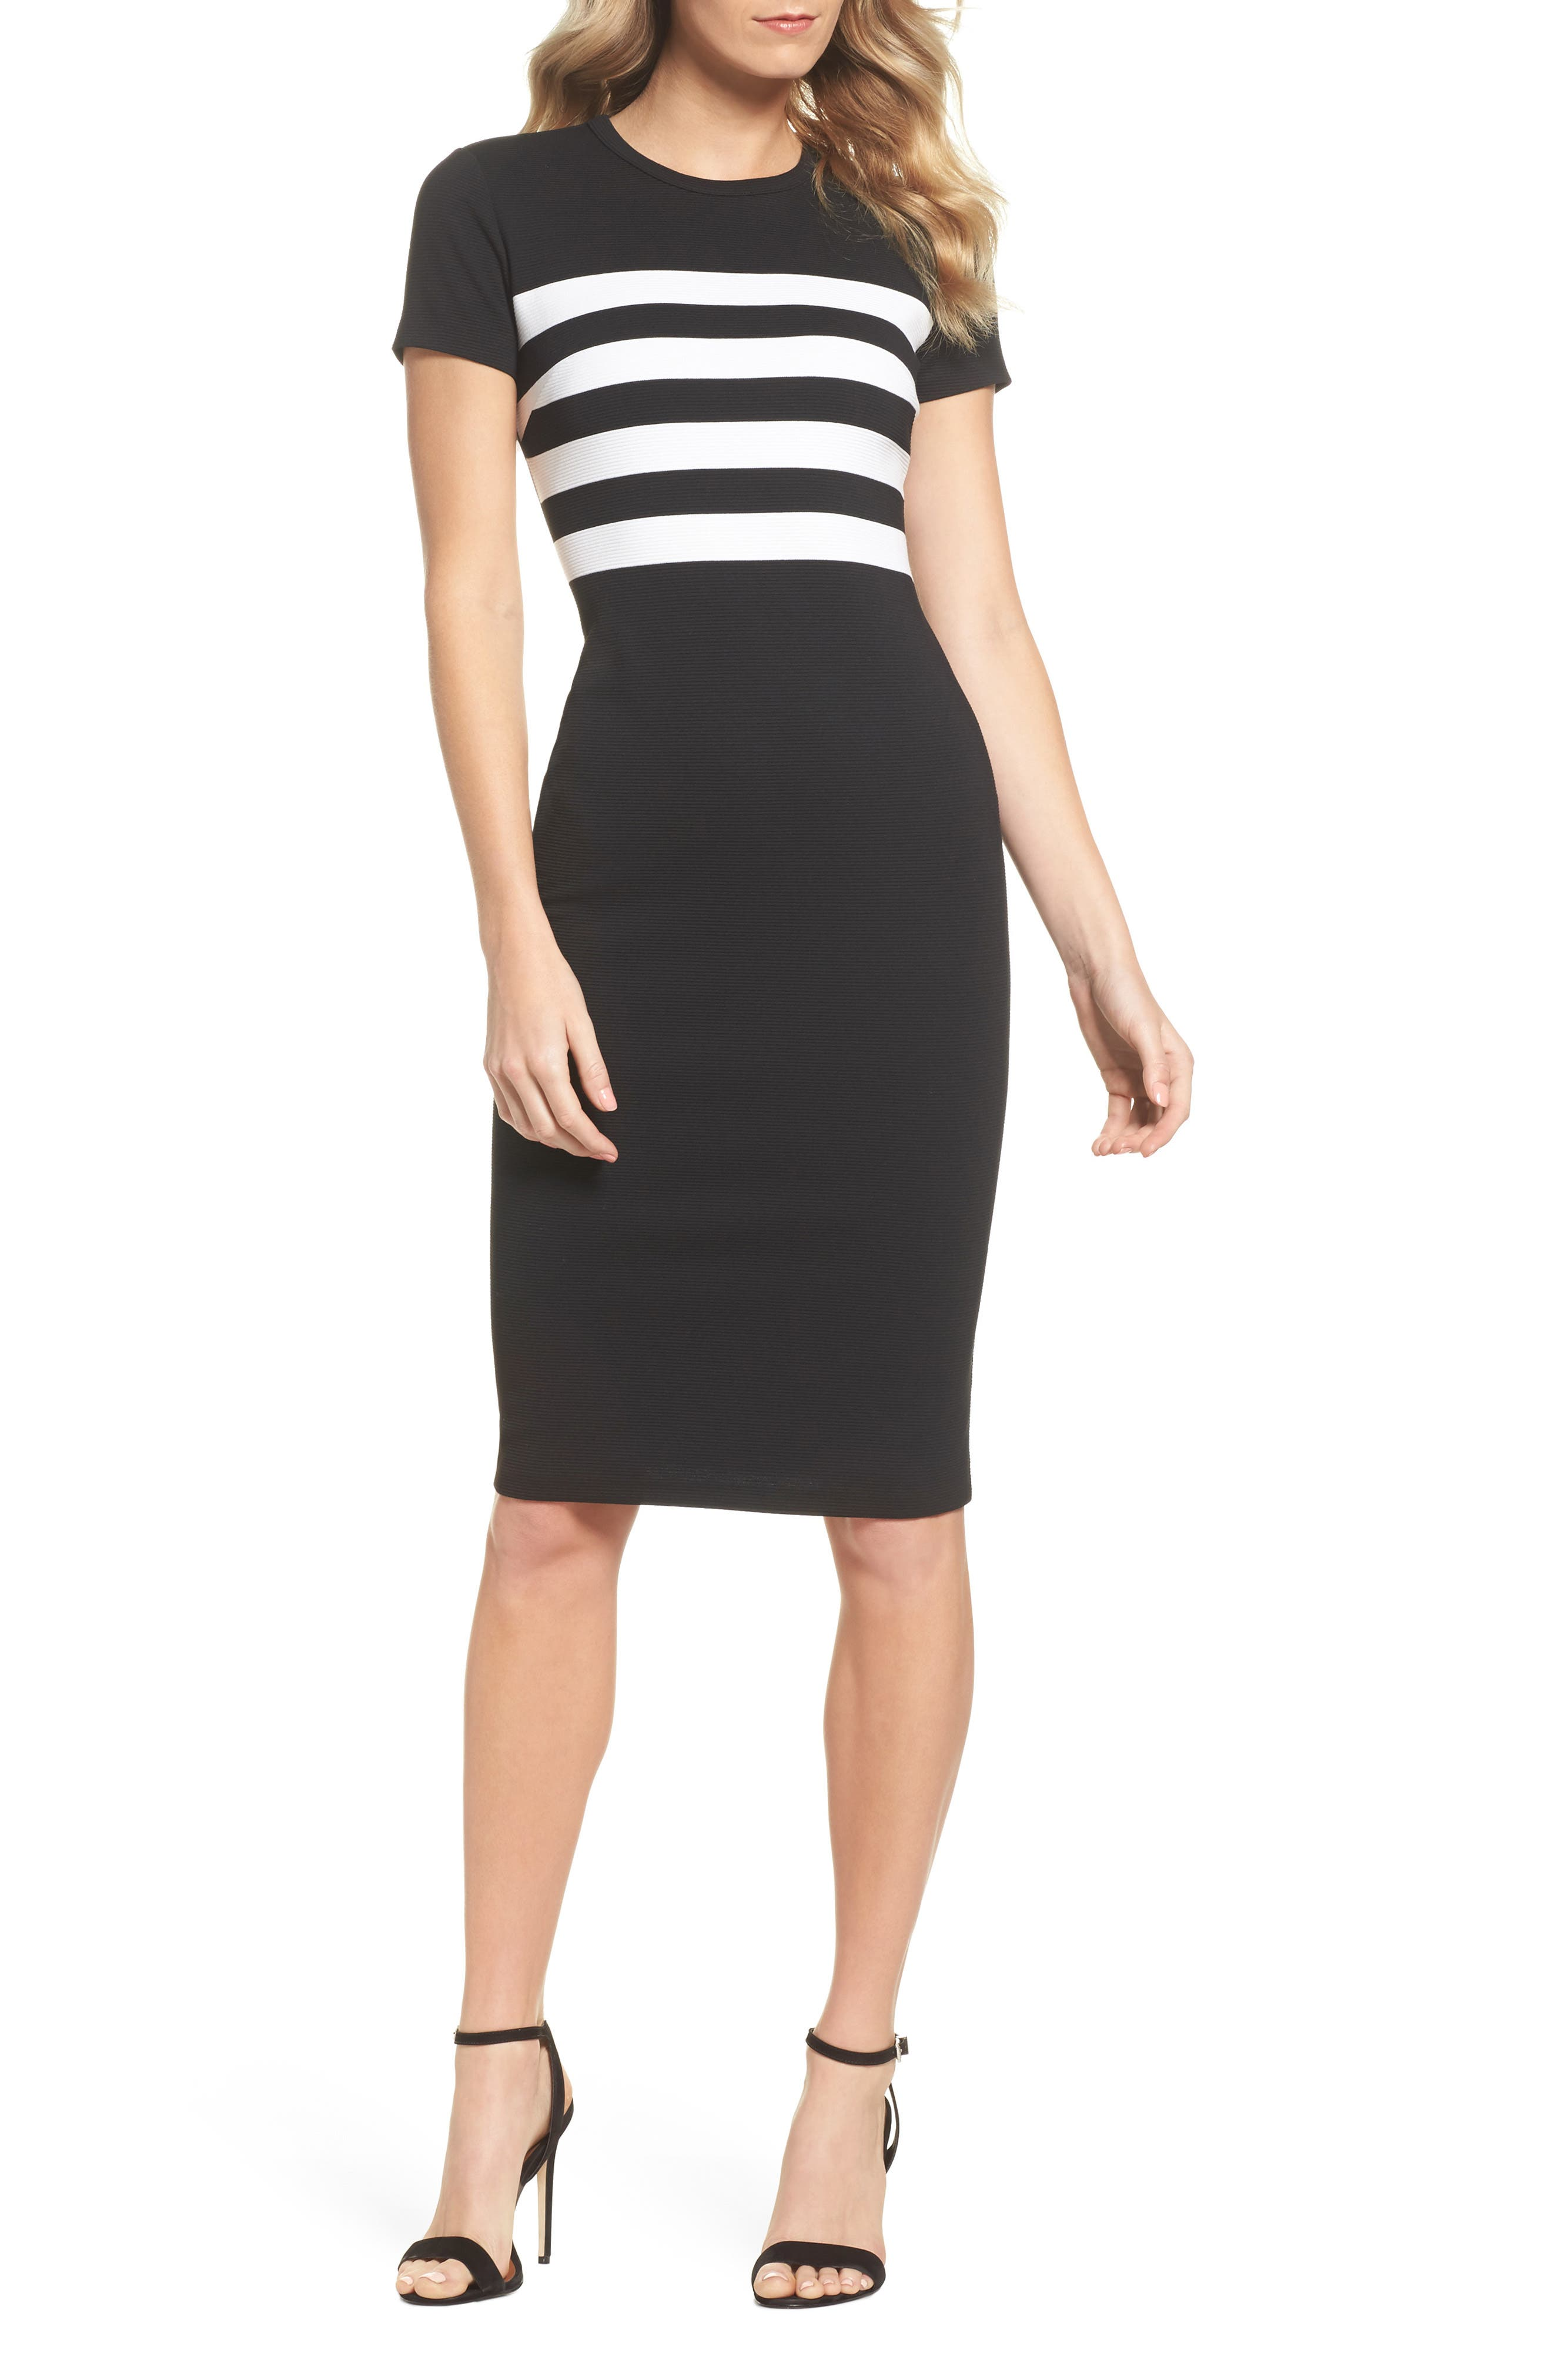 Stripe Ottoman Sheath Dress,                         Main,                         color, Black/ White